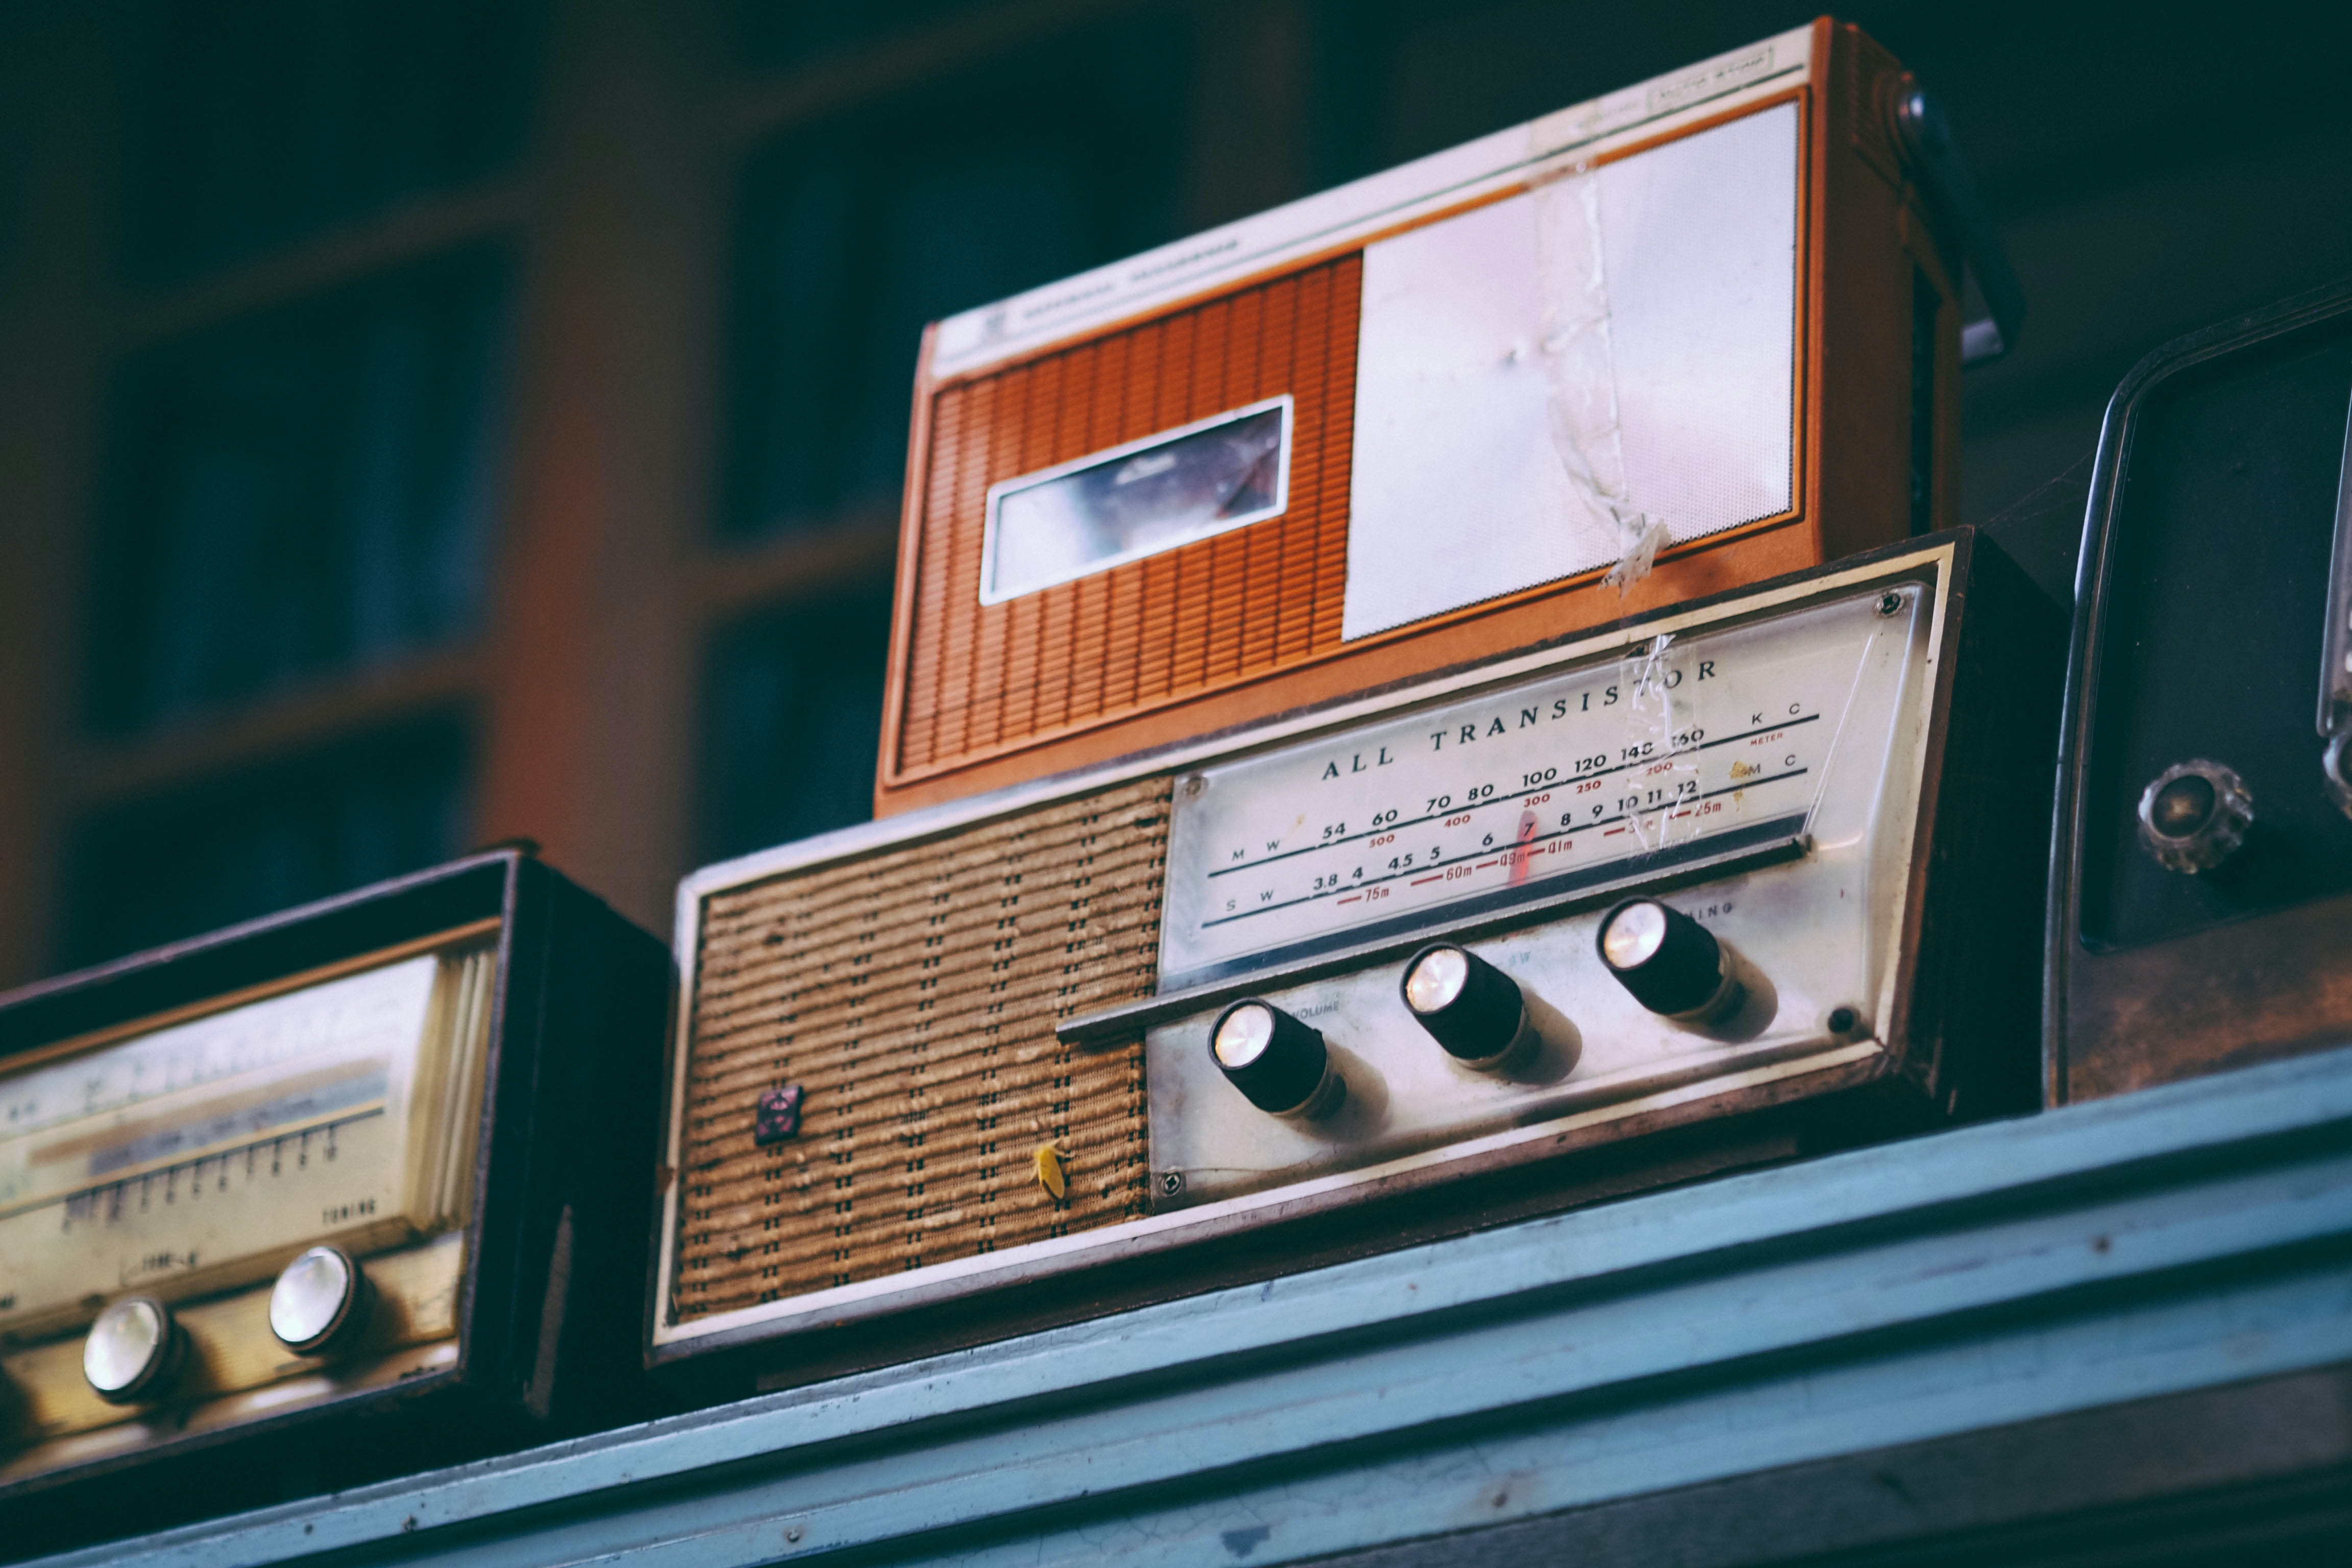 gray and brown transistor radio on table